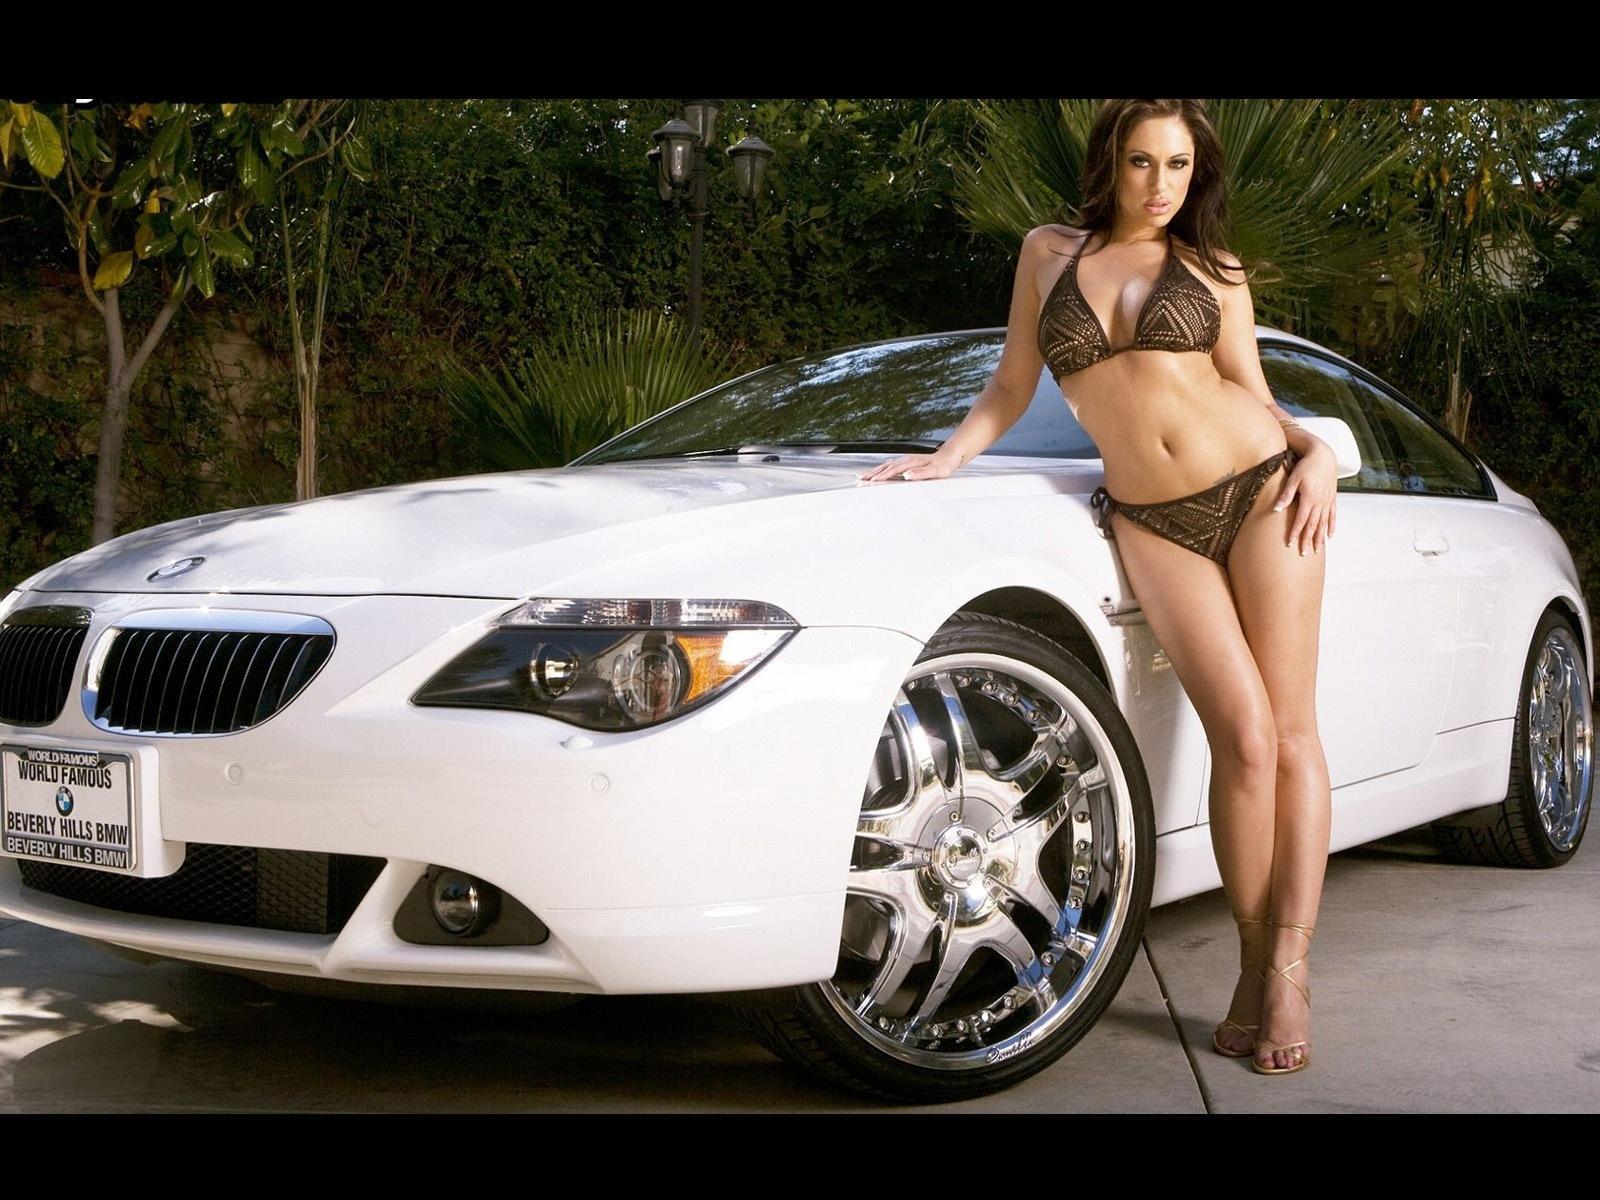 http://1.bp.blogspot.com/-CKRcw8gYcPs/UJf6C7deMTI/AAAAAAAACpM/7uVC3YwWSXk/s1600/BMW+madchen.jpg